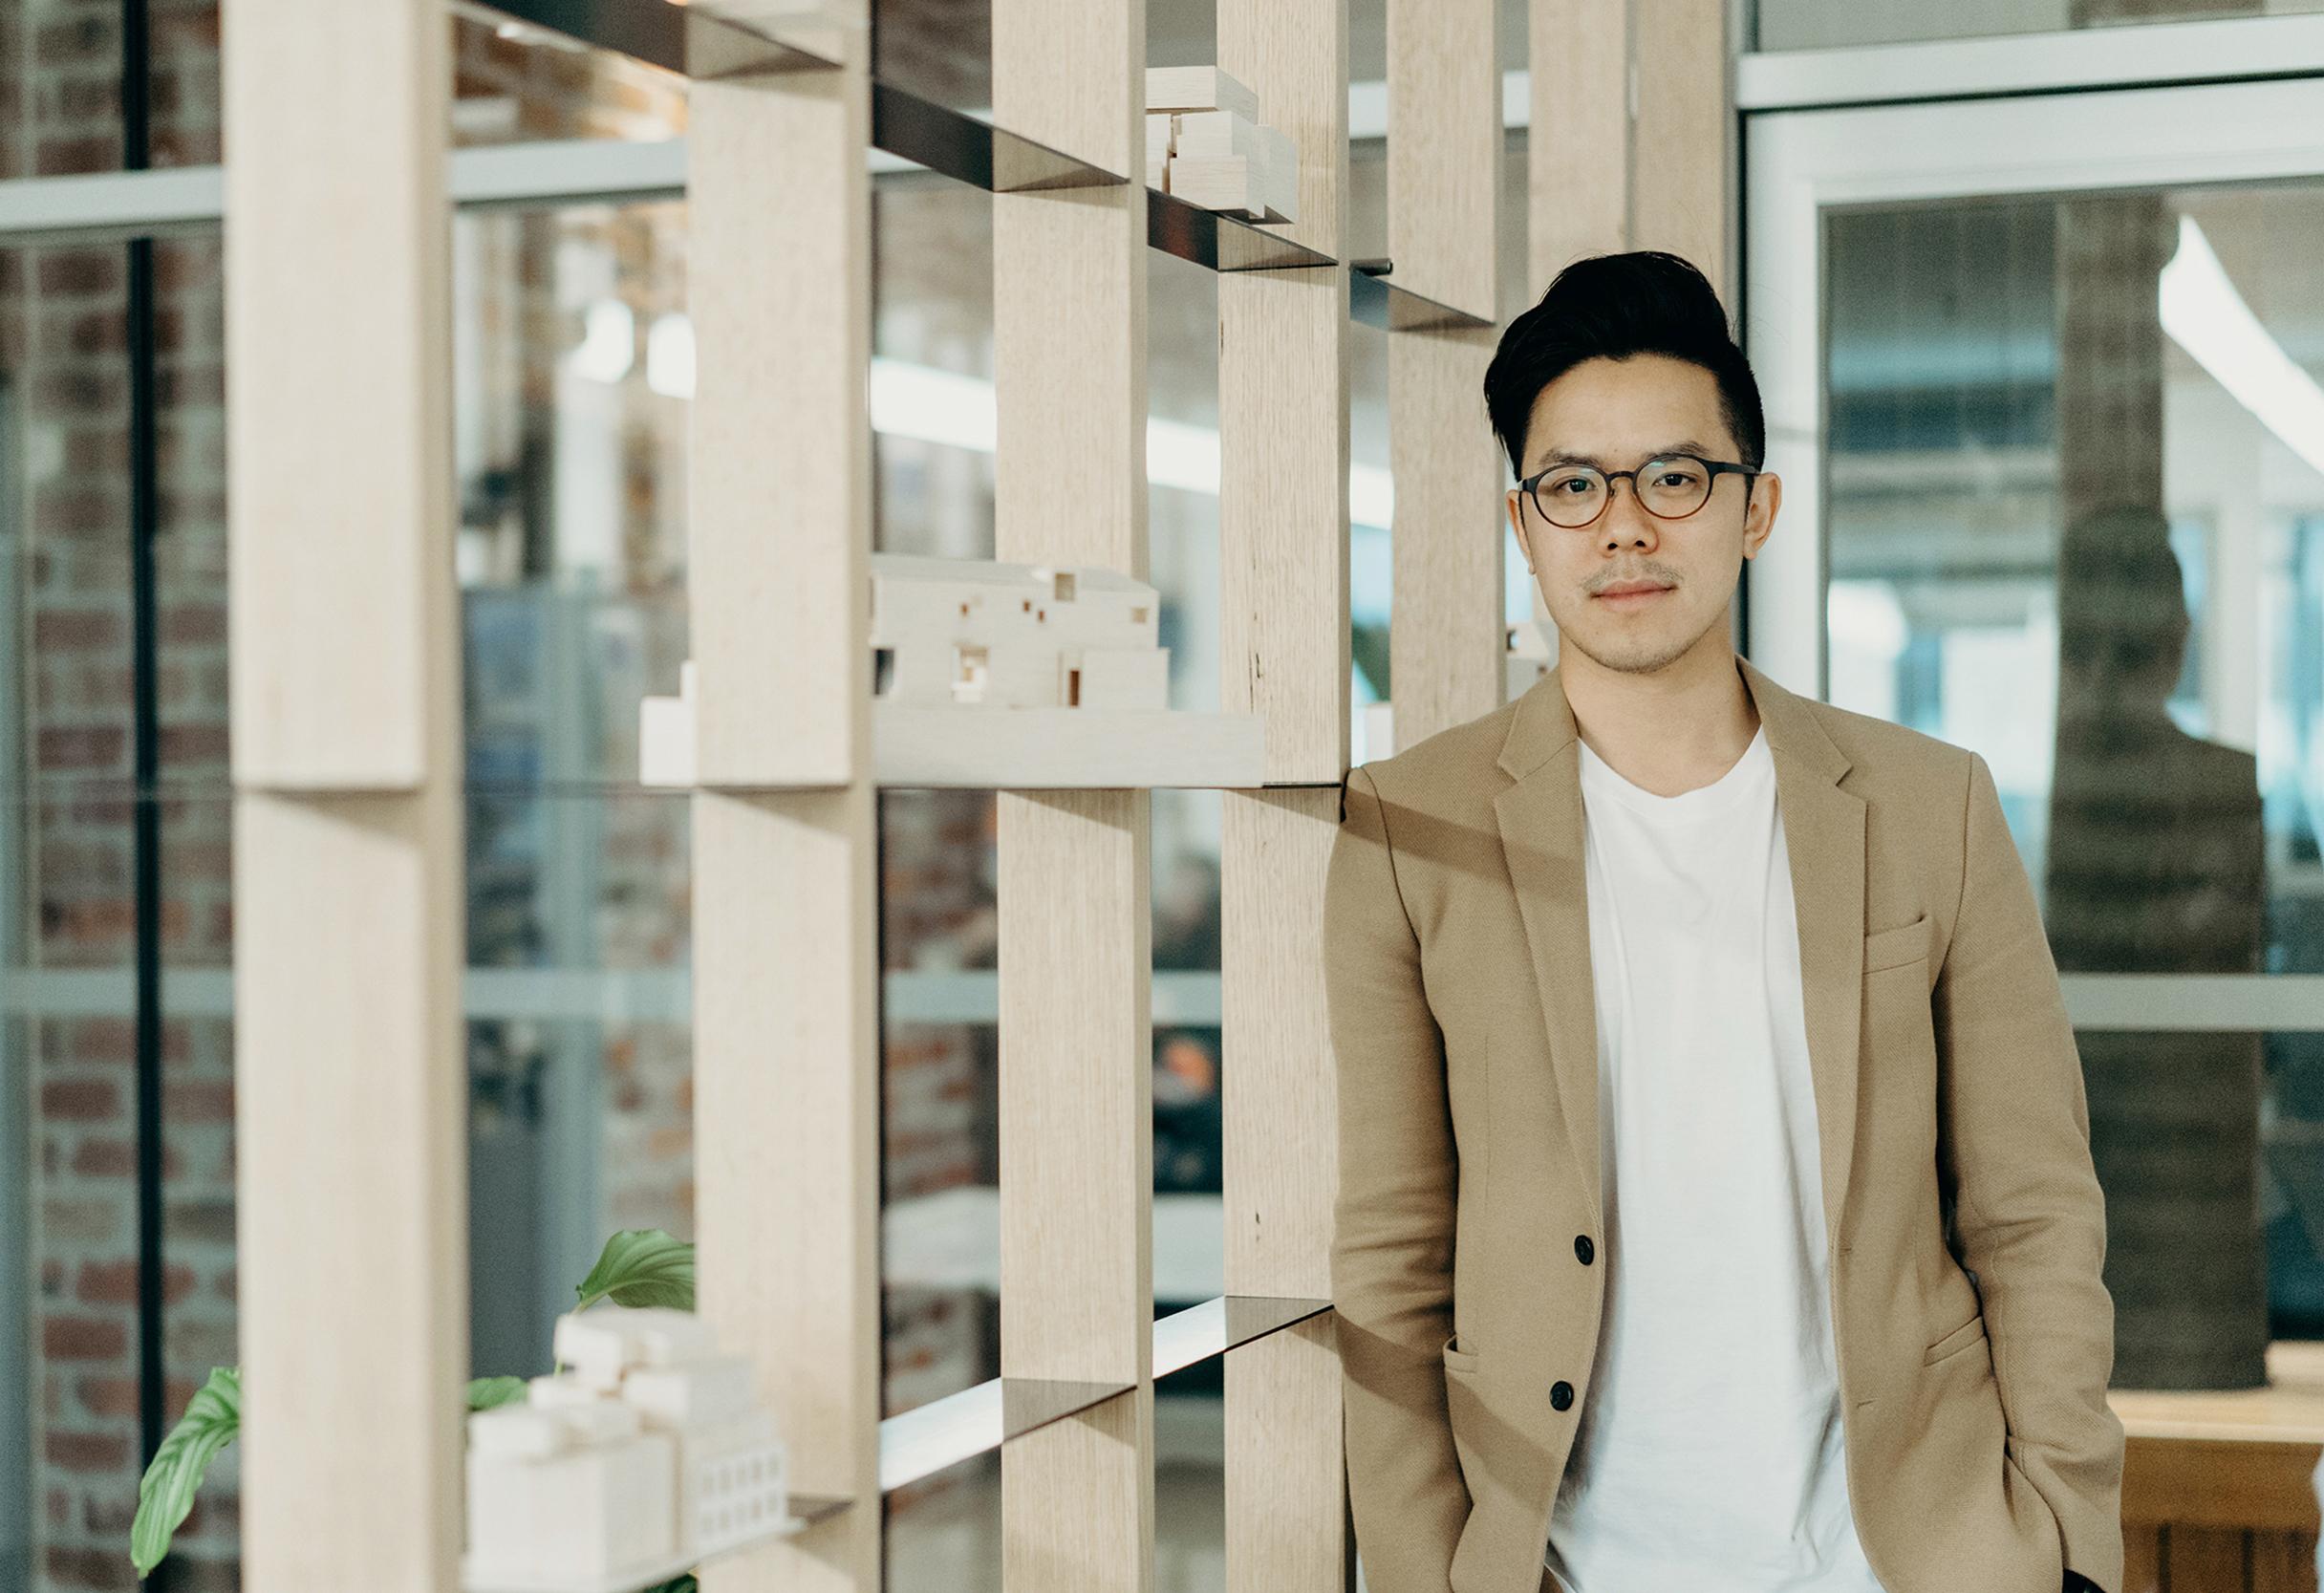 WALA_Director_Weian Lim profile.jpg